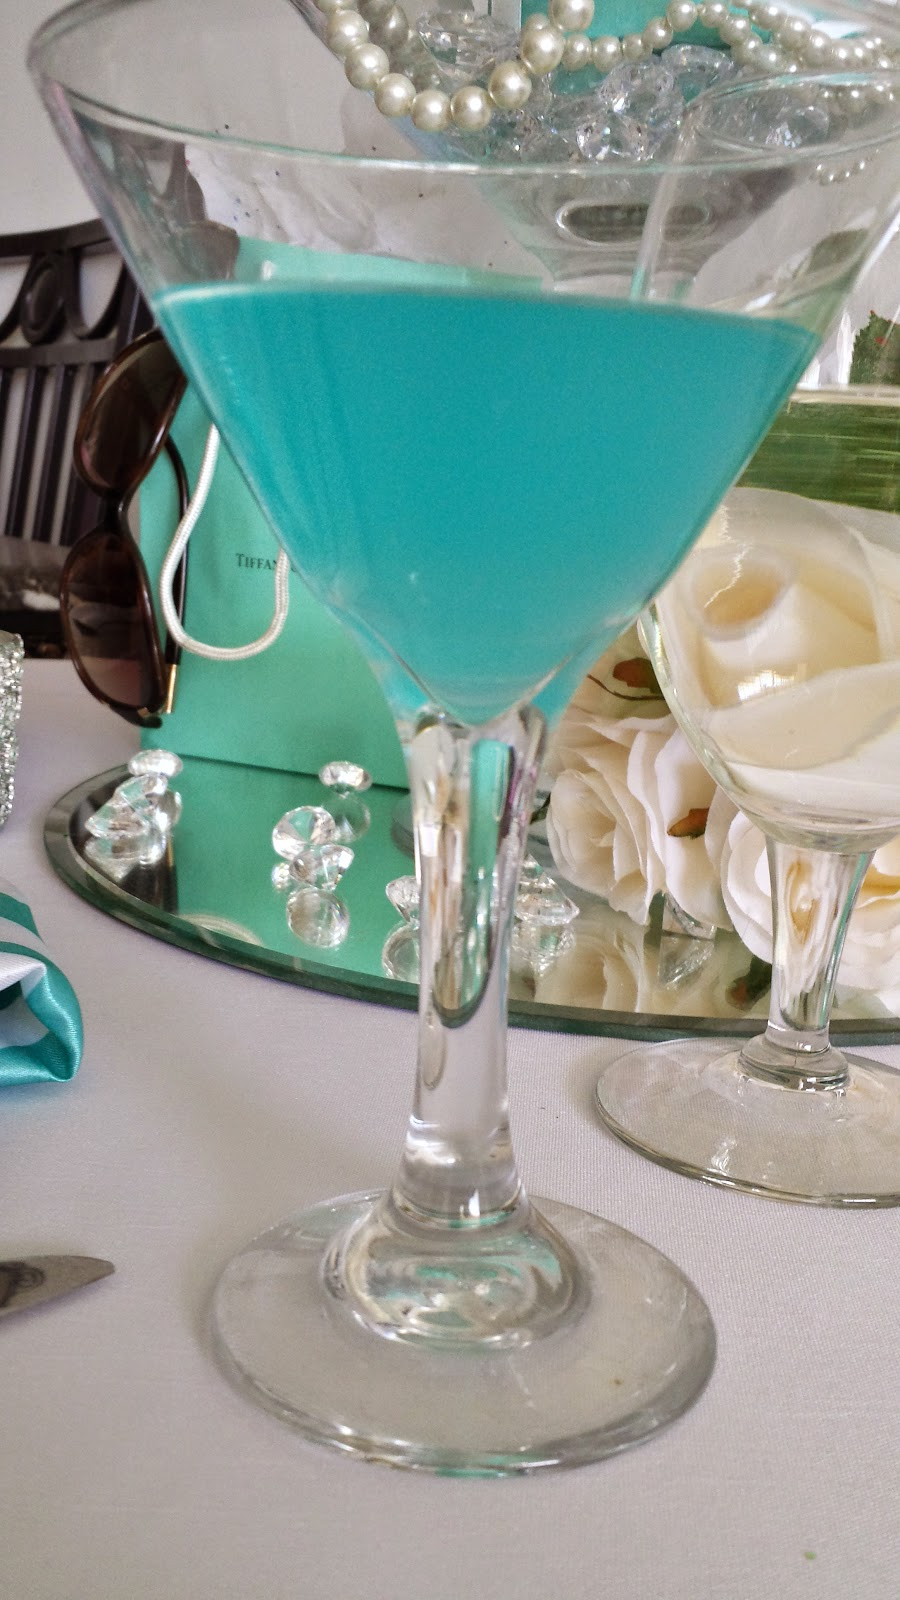 Breakfast at Tiffany Theme Centerpiece, DIY centerpiece idea, Paper Mache Craft,